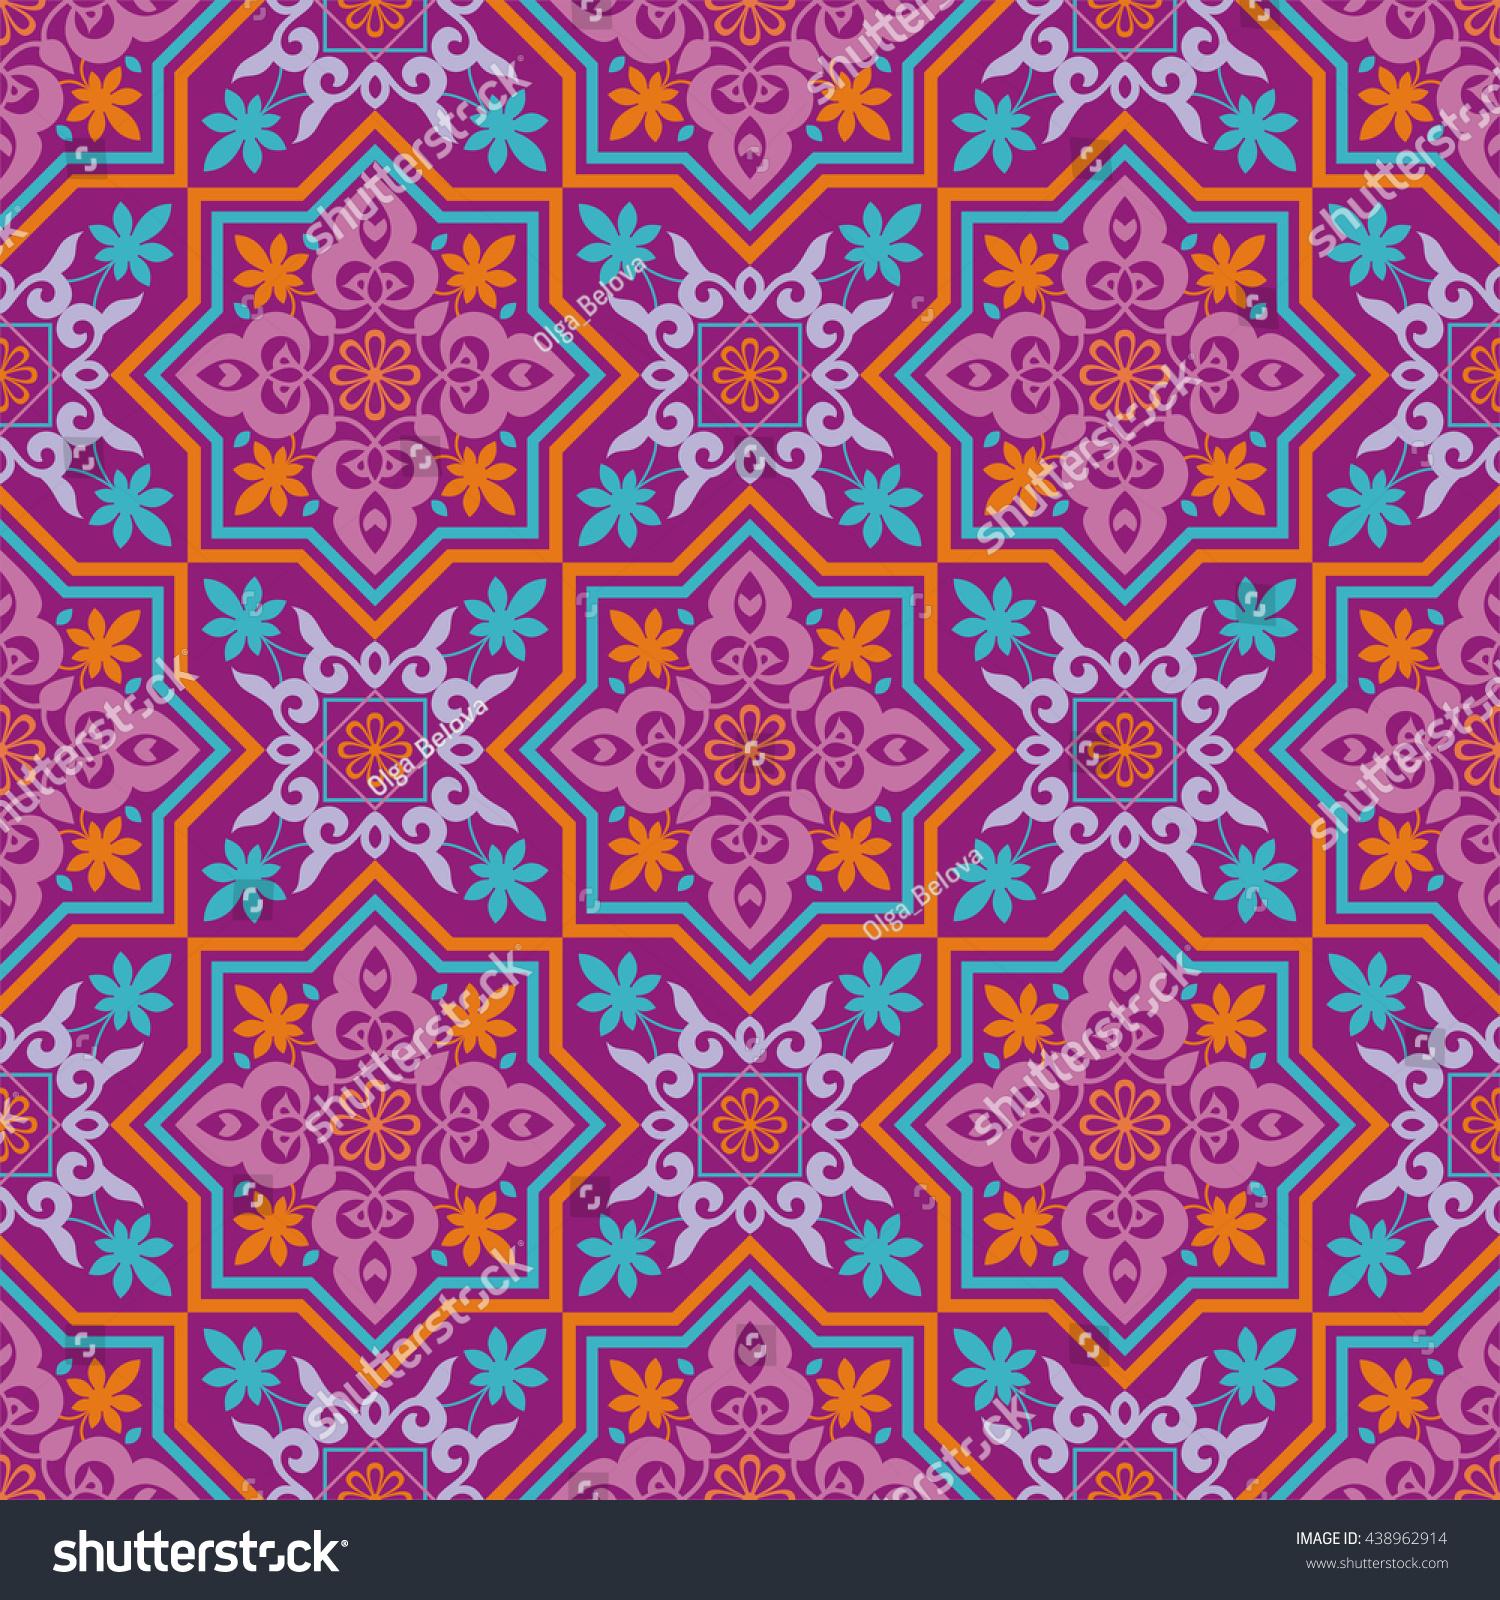 Arabesque pattern moorish style arab seamless stock vector for Arabesque style decoration